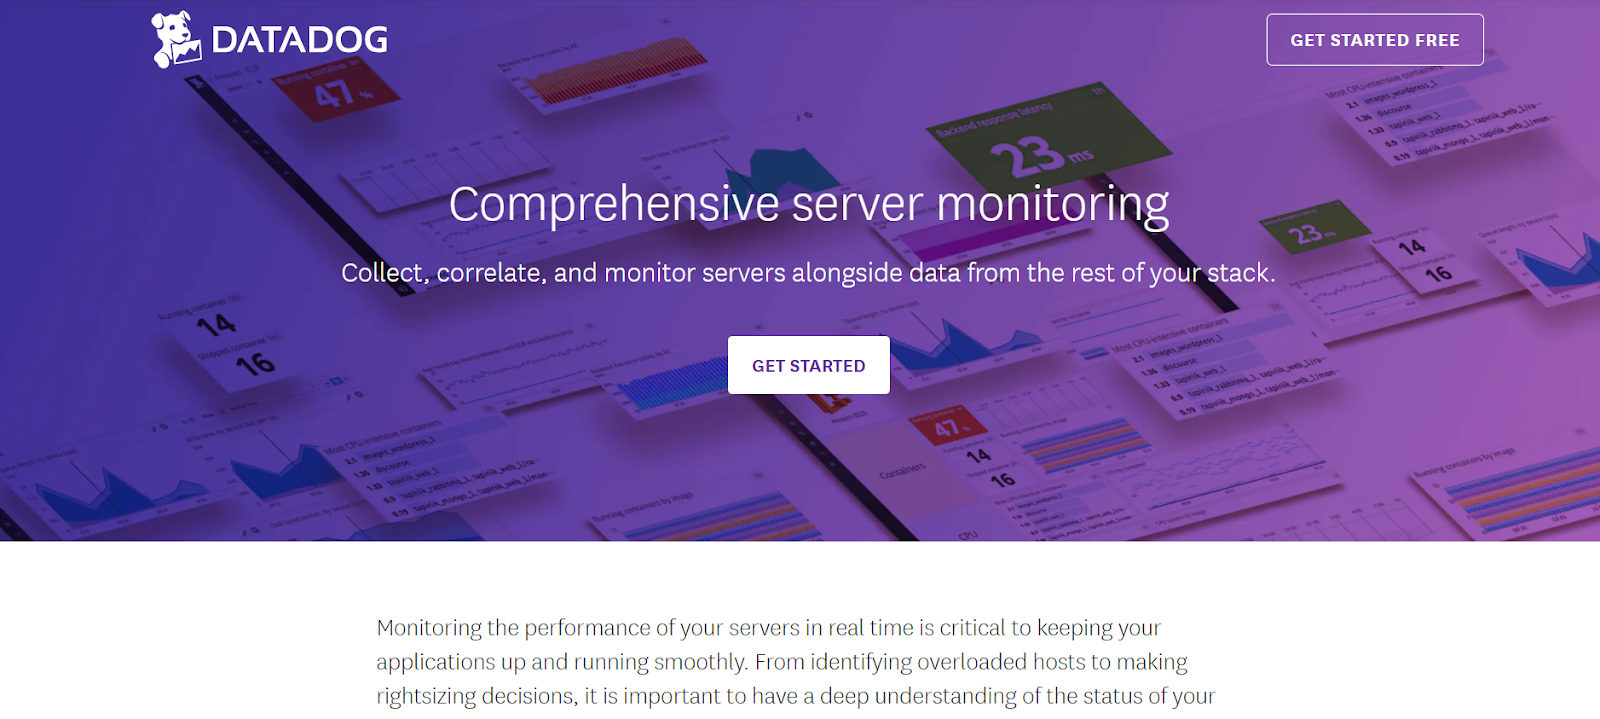 Datadog Server Application Monitoring Software